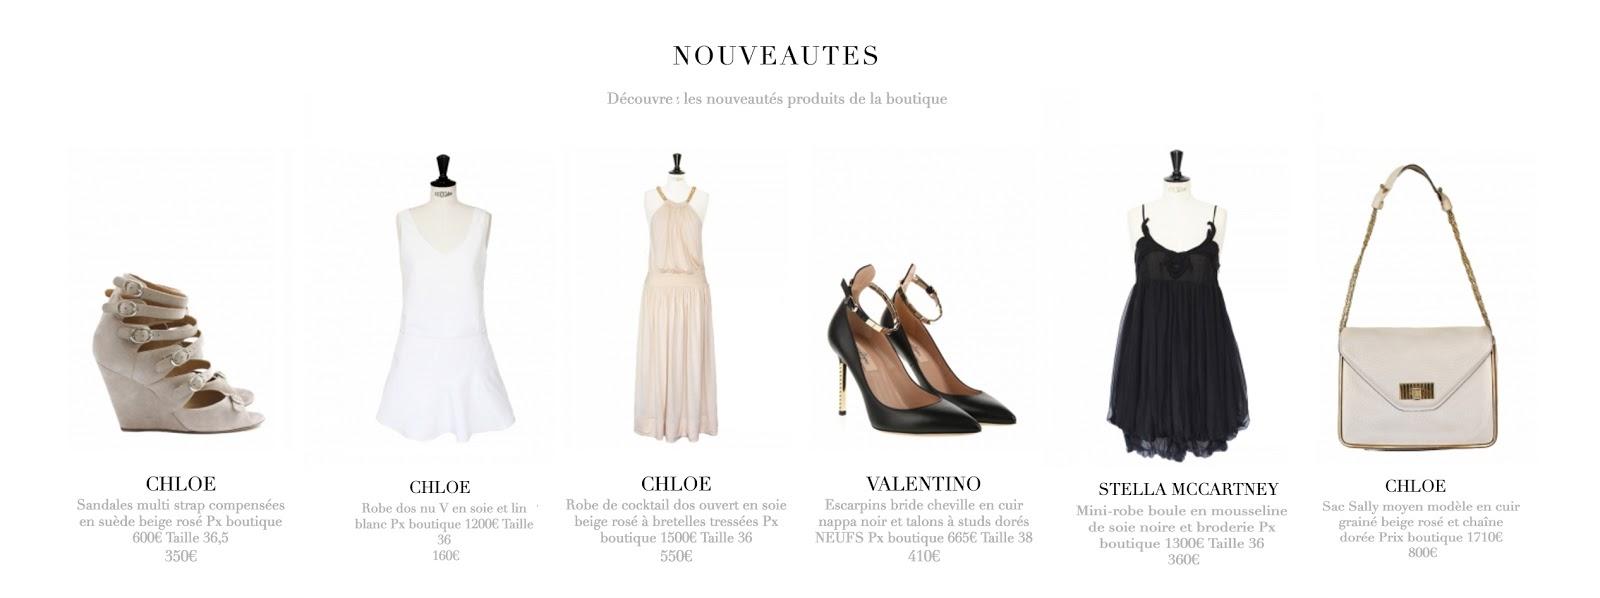 89f393891f95 De sublimes nouveautés Valentino, Chloé, Stella McCartney, Gucci, Prada,  Balenciaga et Iro